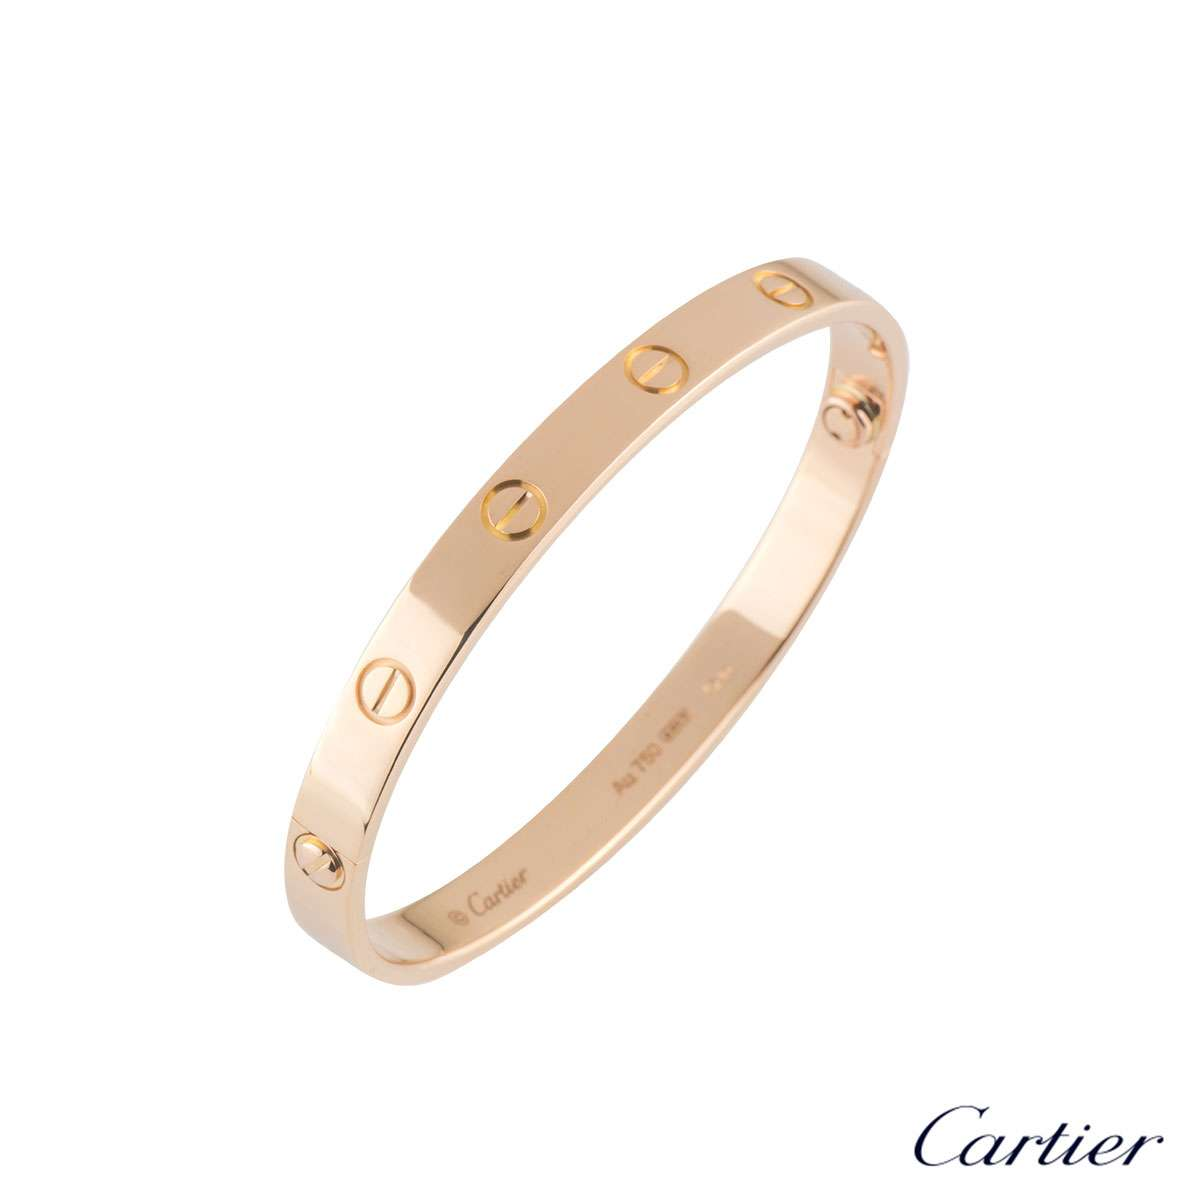 Cartier Rose Gold Love Bracelet Size 19 B6035619